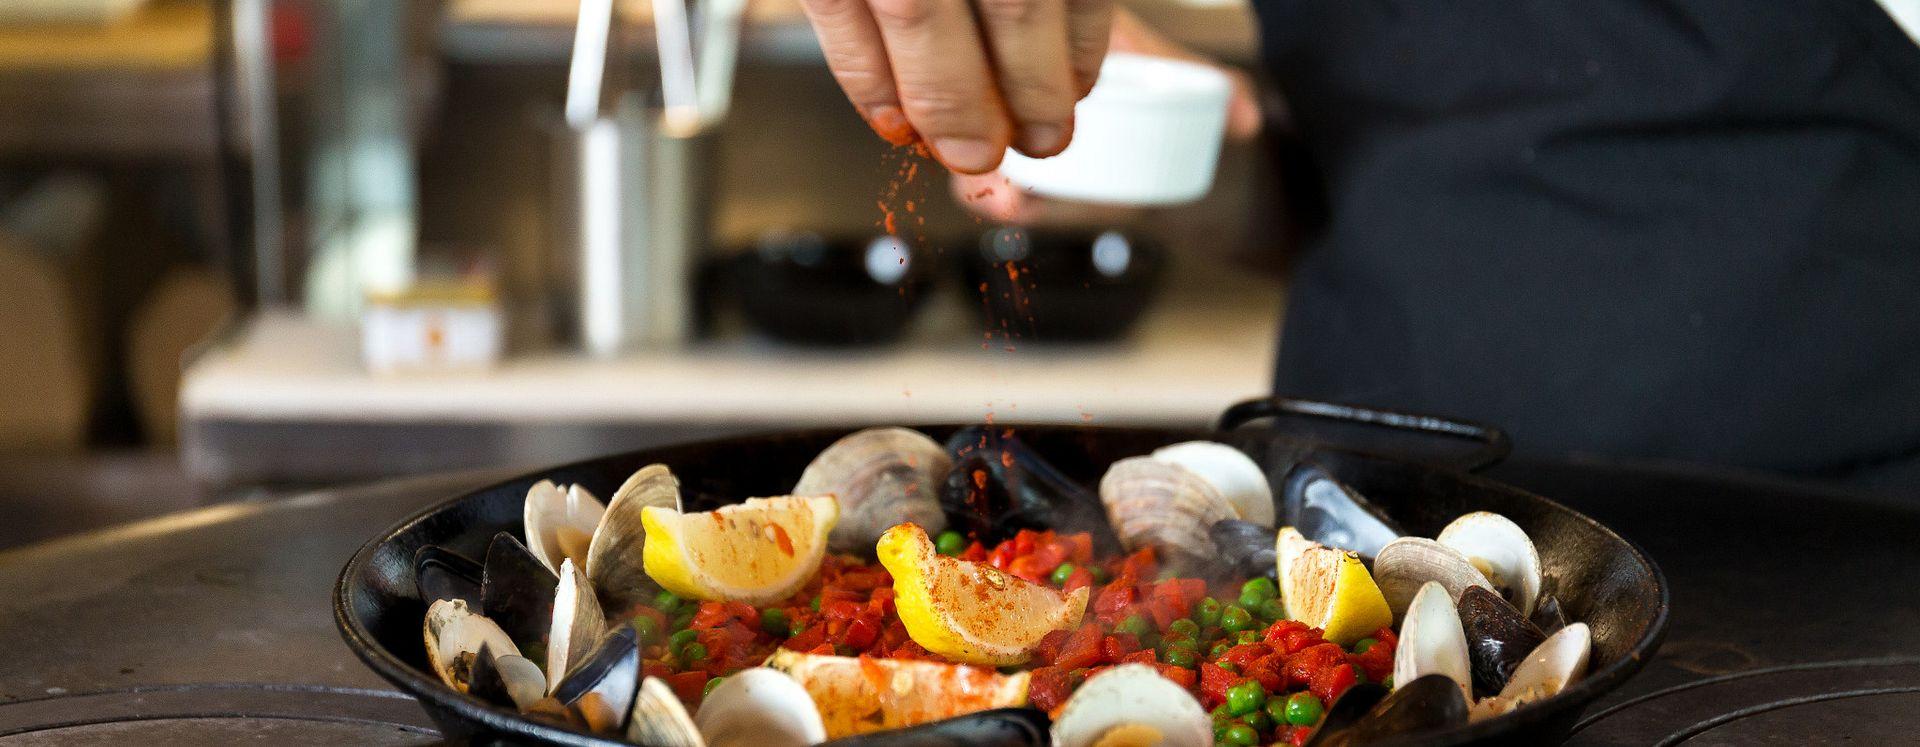 Tapa Toro Tapas Bar & Paella Pit ICON Orlando 360™ restaurant dining paella cooking chef